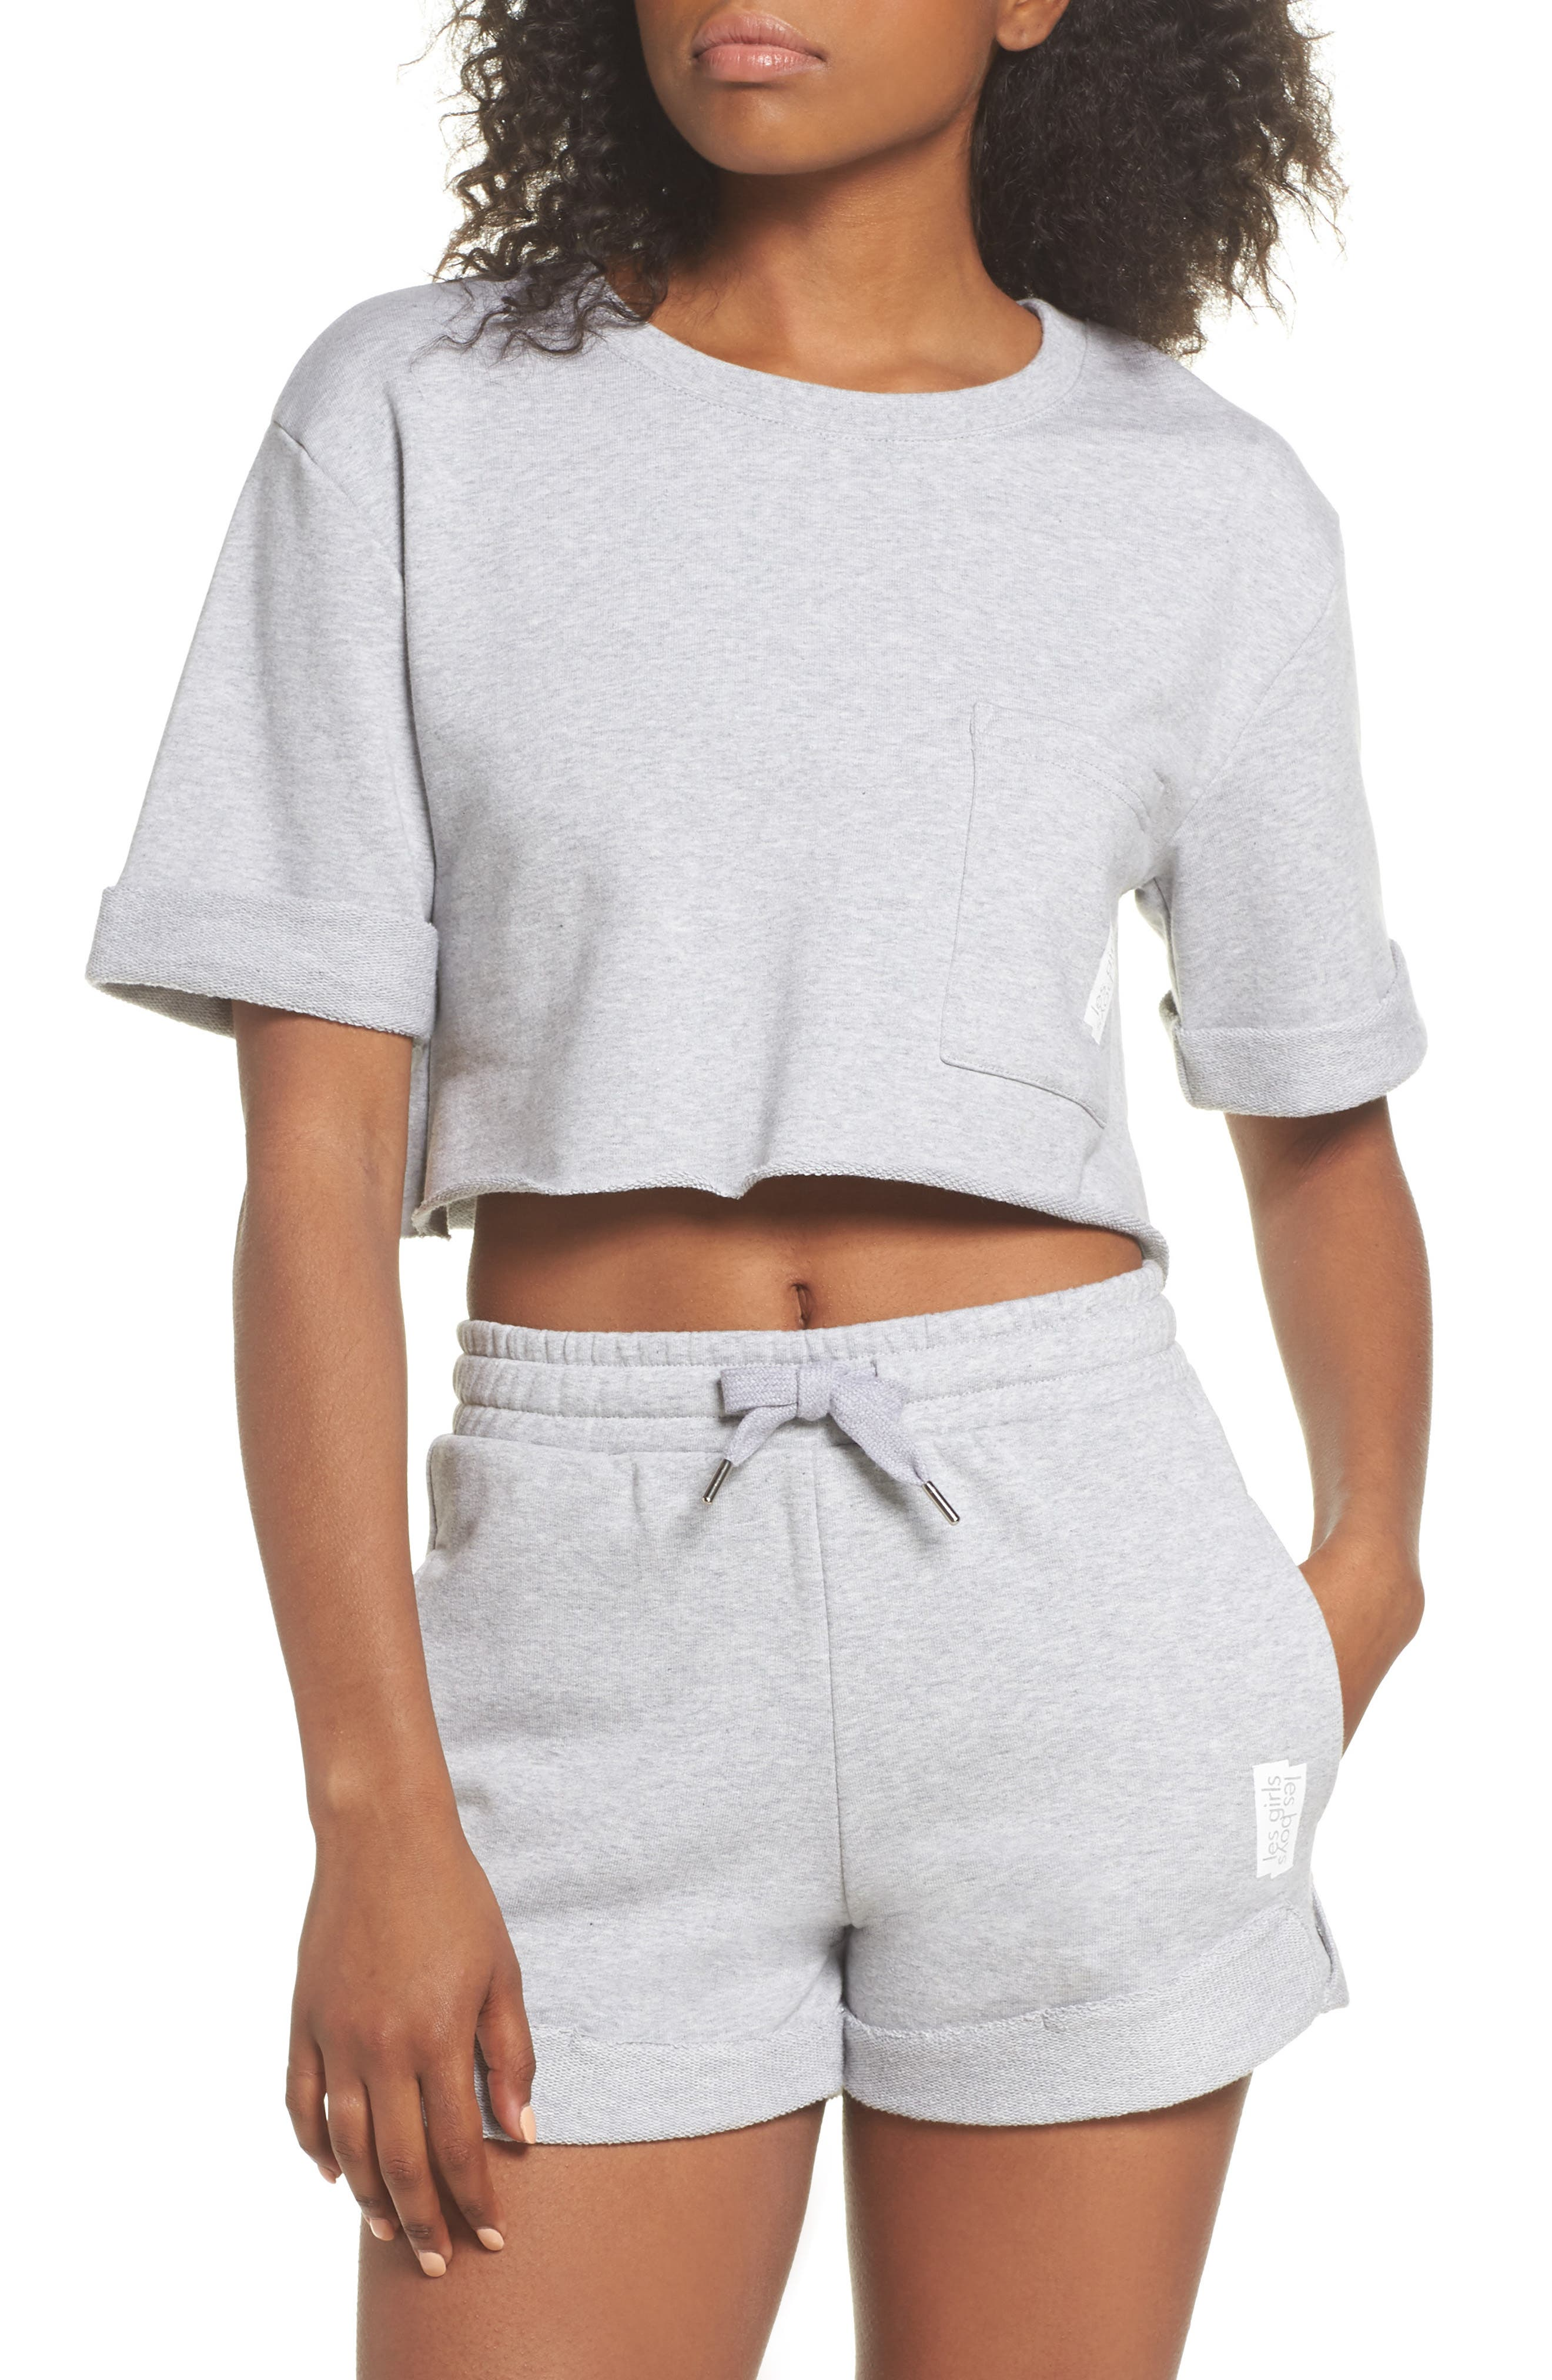 French Terry Crop Sweatshirt,                             Alternate thumbnail 4, color,                             Light Grey Marl